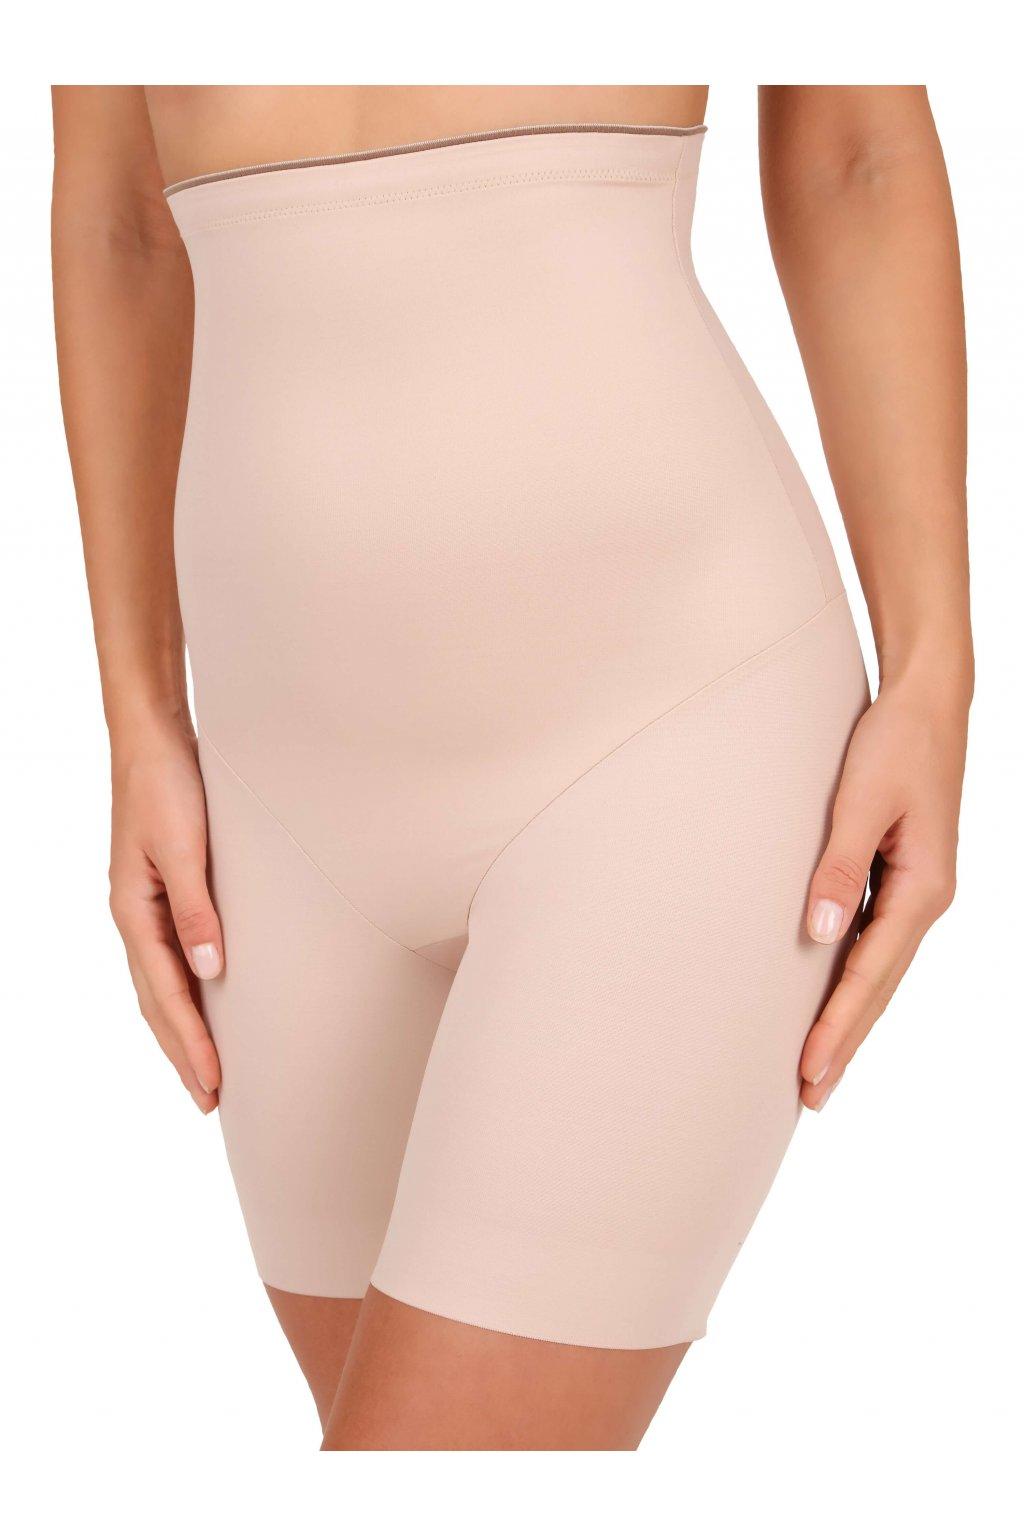 felina conturelle soft touch maxi longpants 88222 sand front